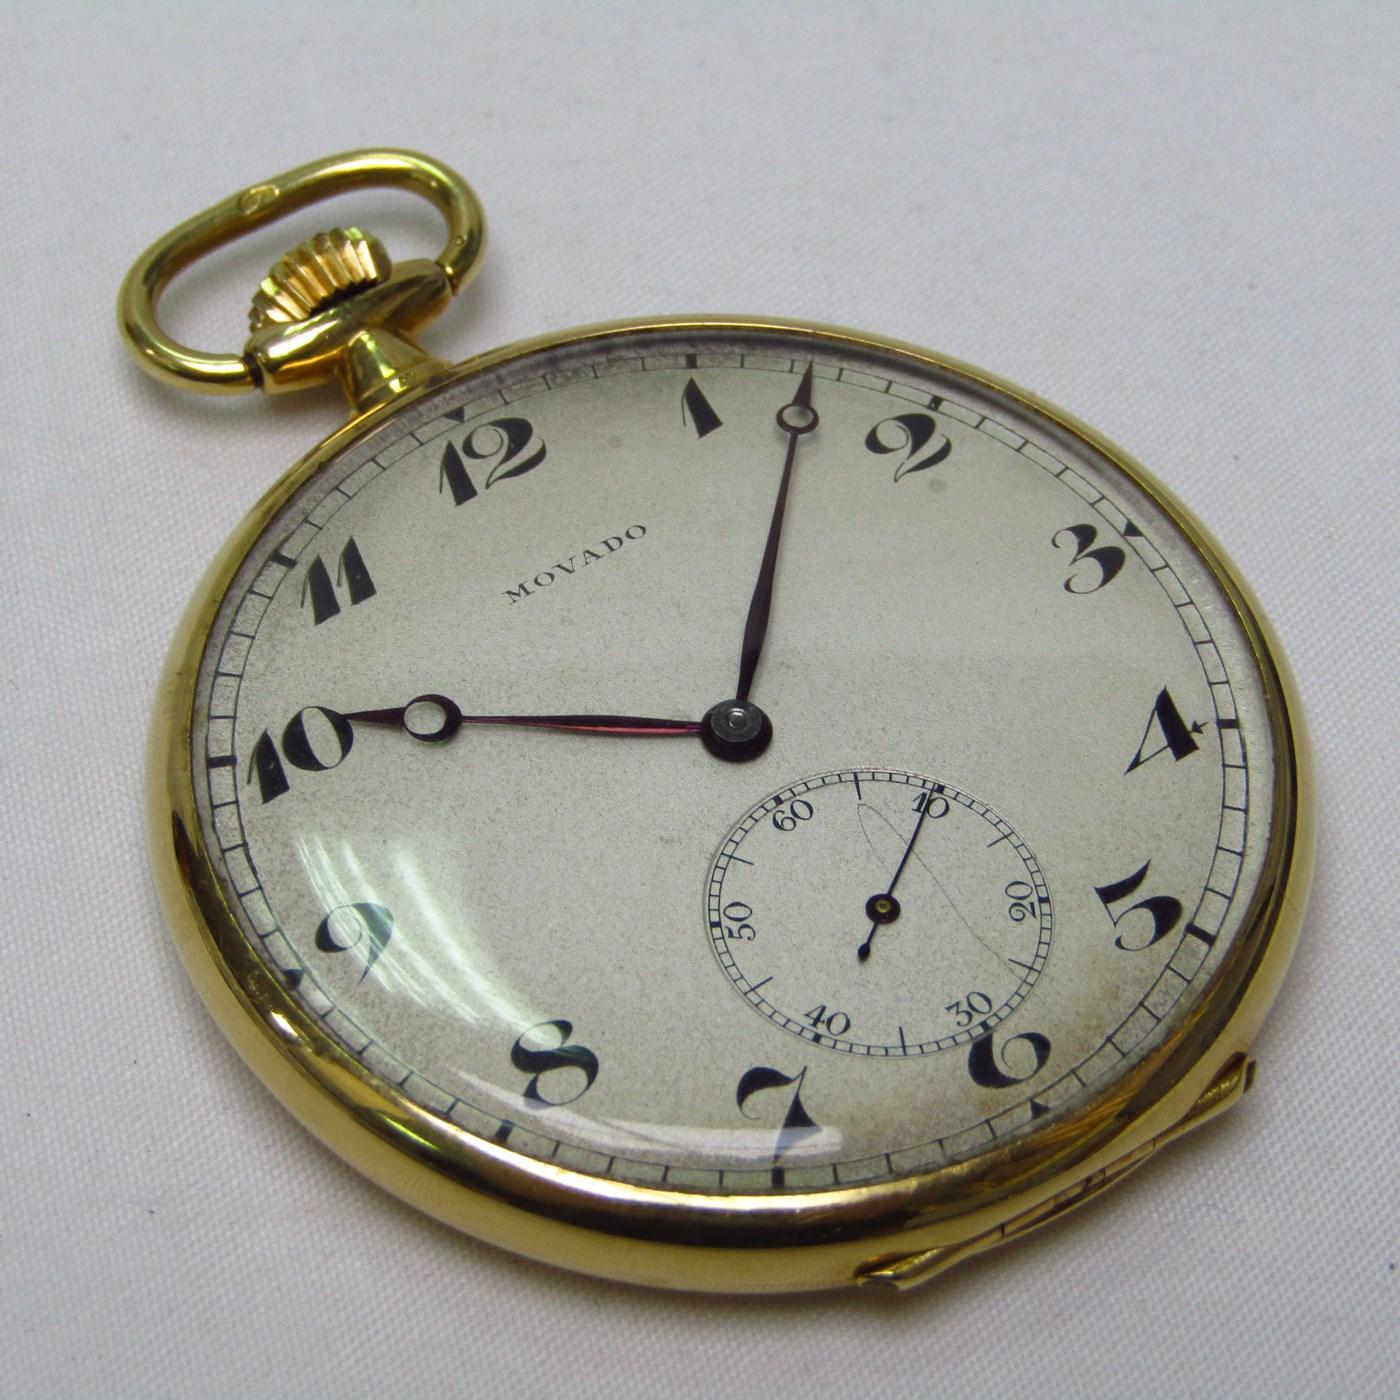 Movado. Reloj de Bolsillo, Lepine y Remontoir. Pps. Siglo XX.